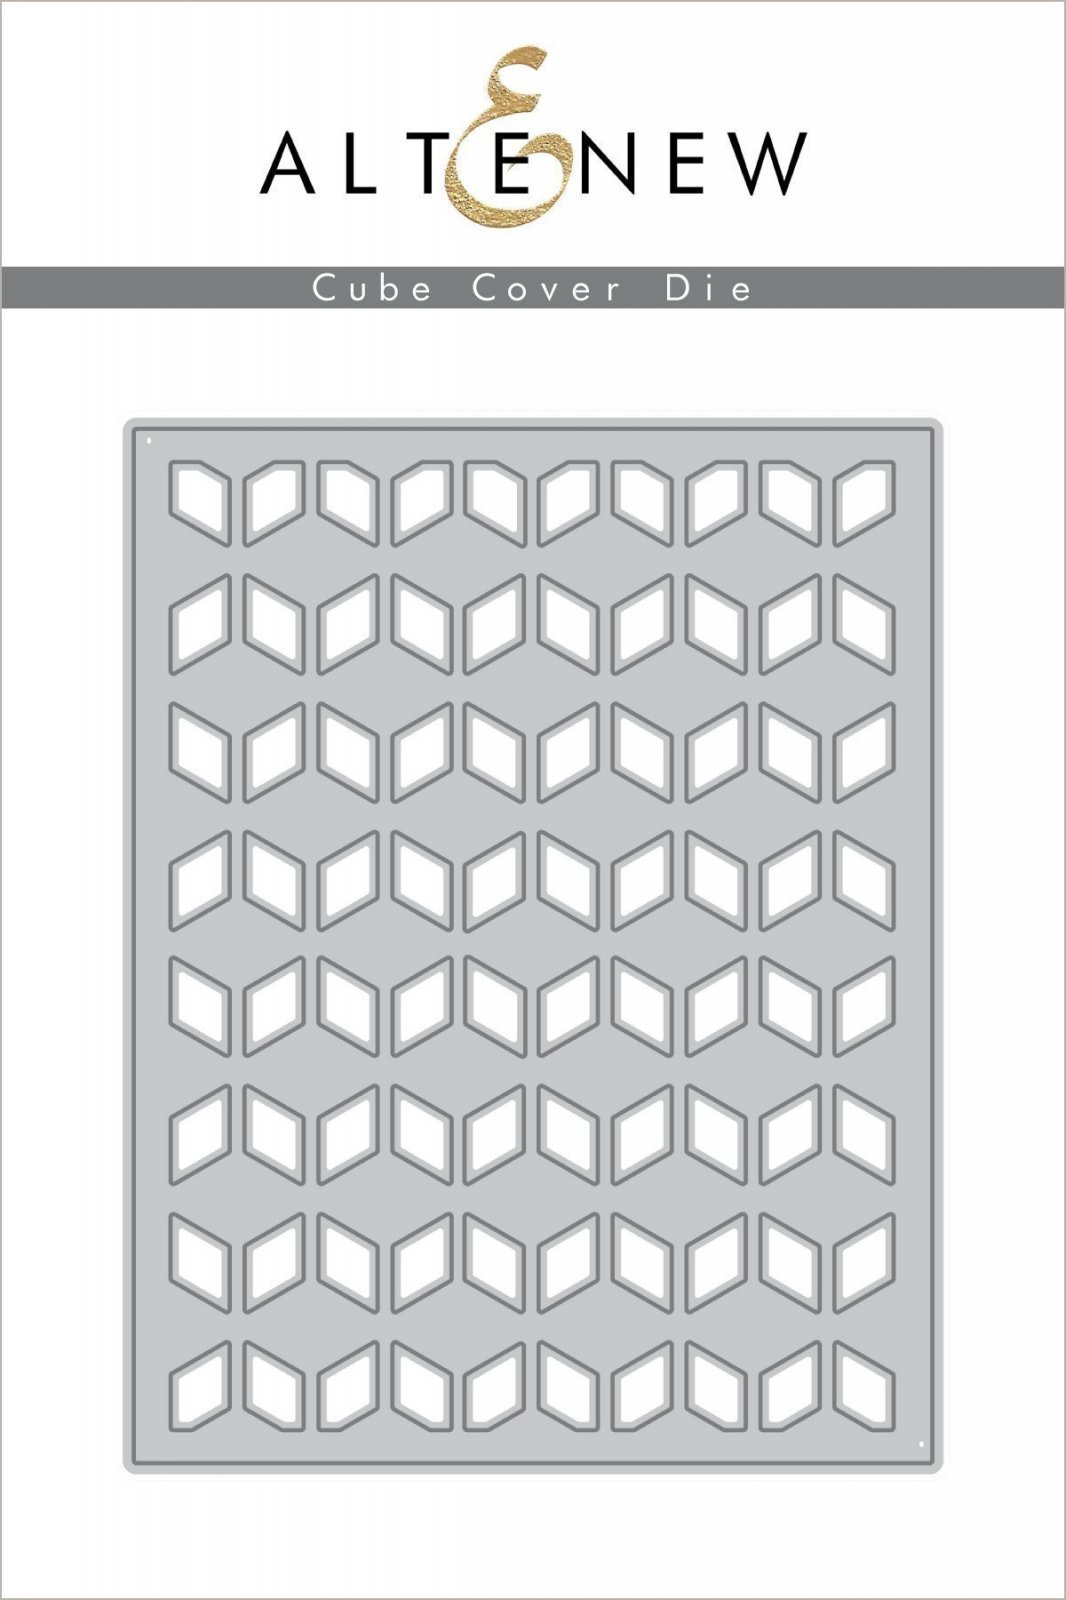 Altenew - Cube Cover Die